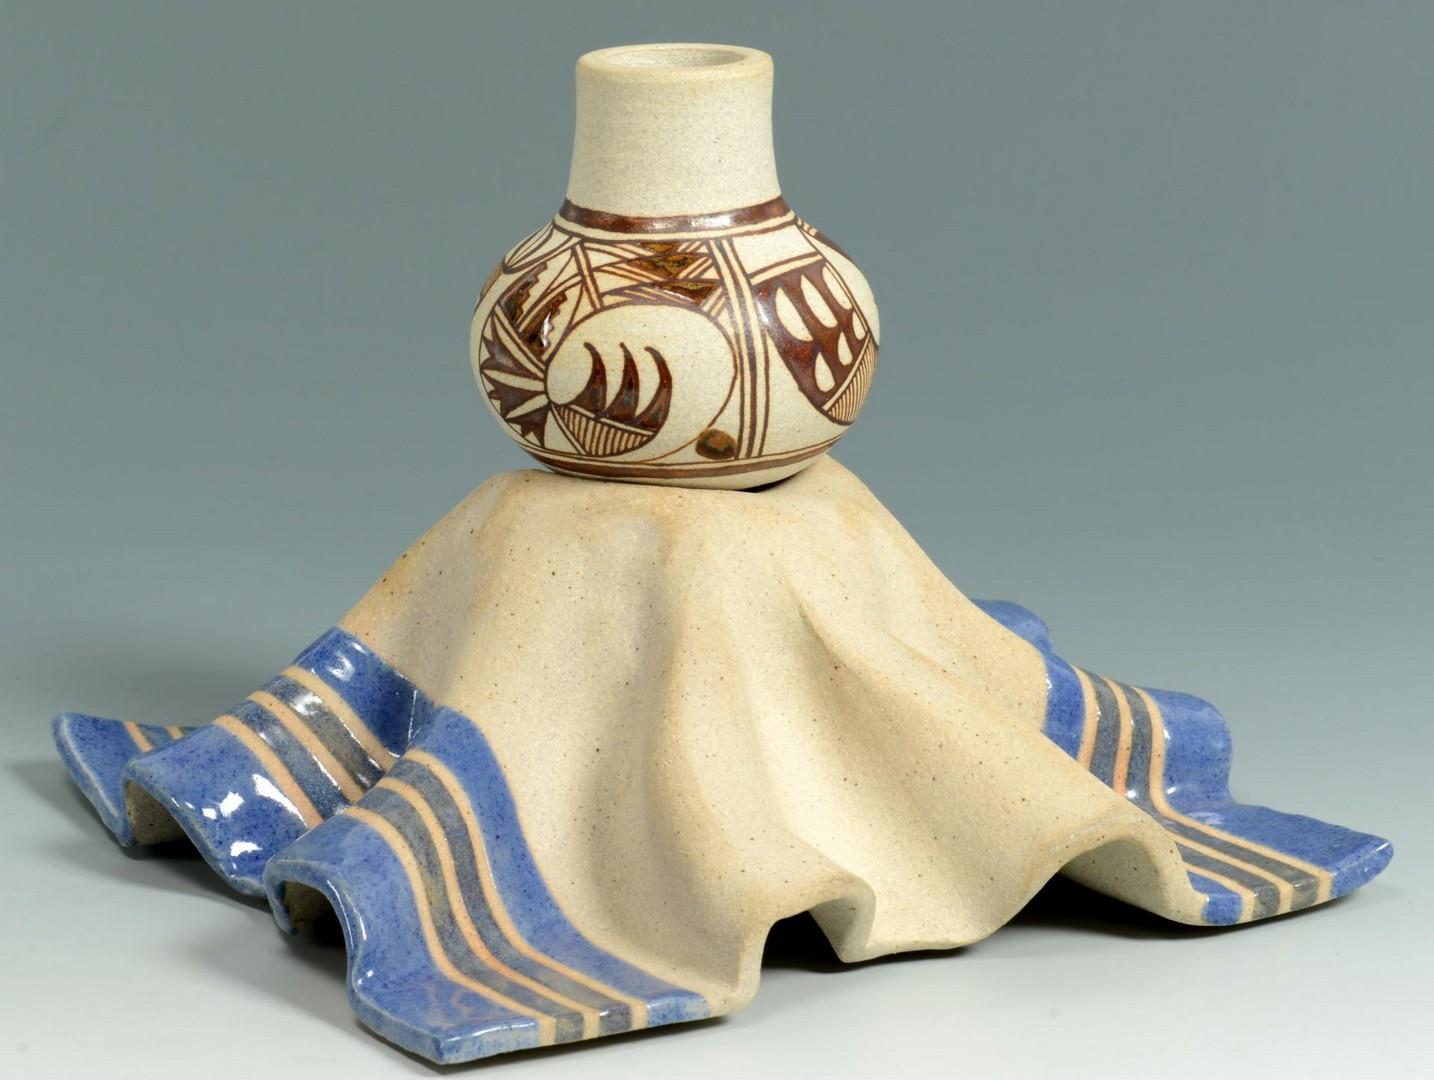 Lot 3383269: 4 Southwest Art Items